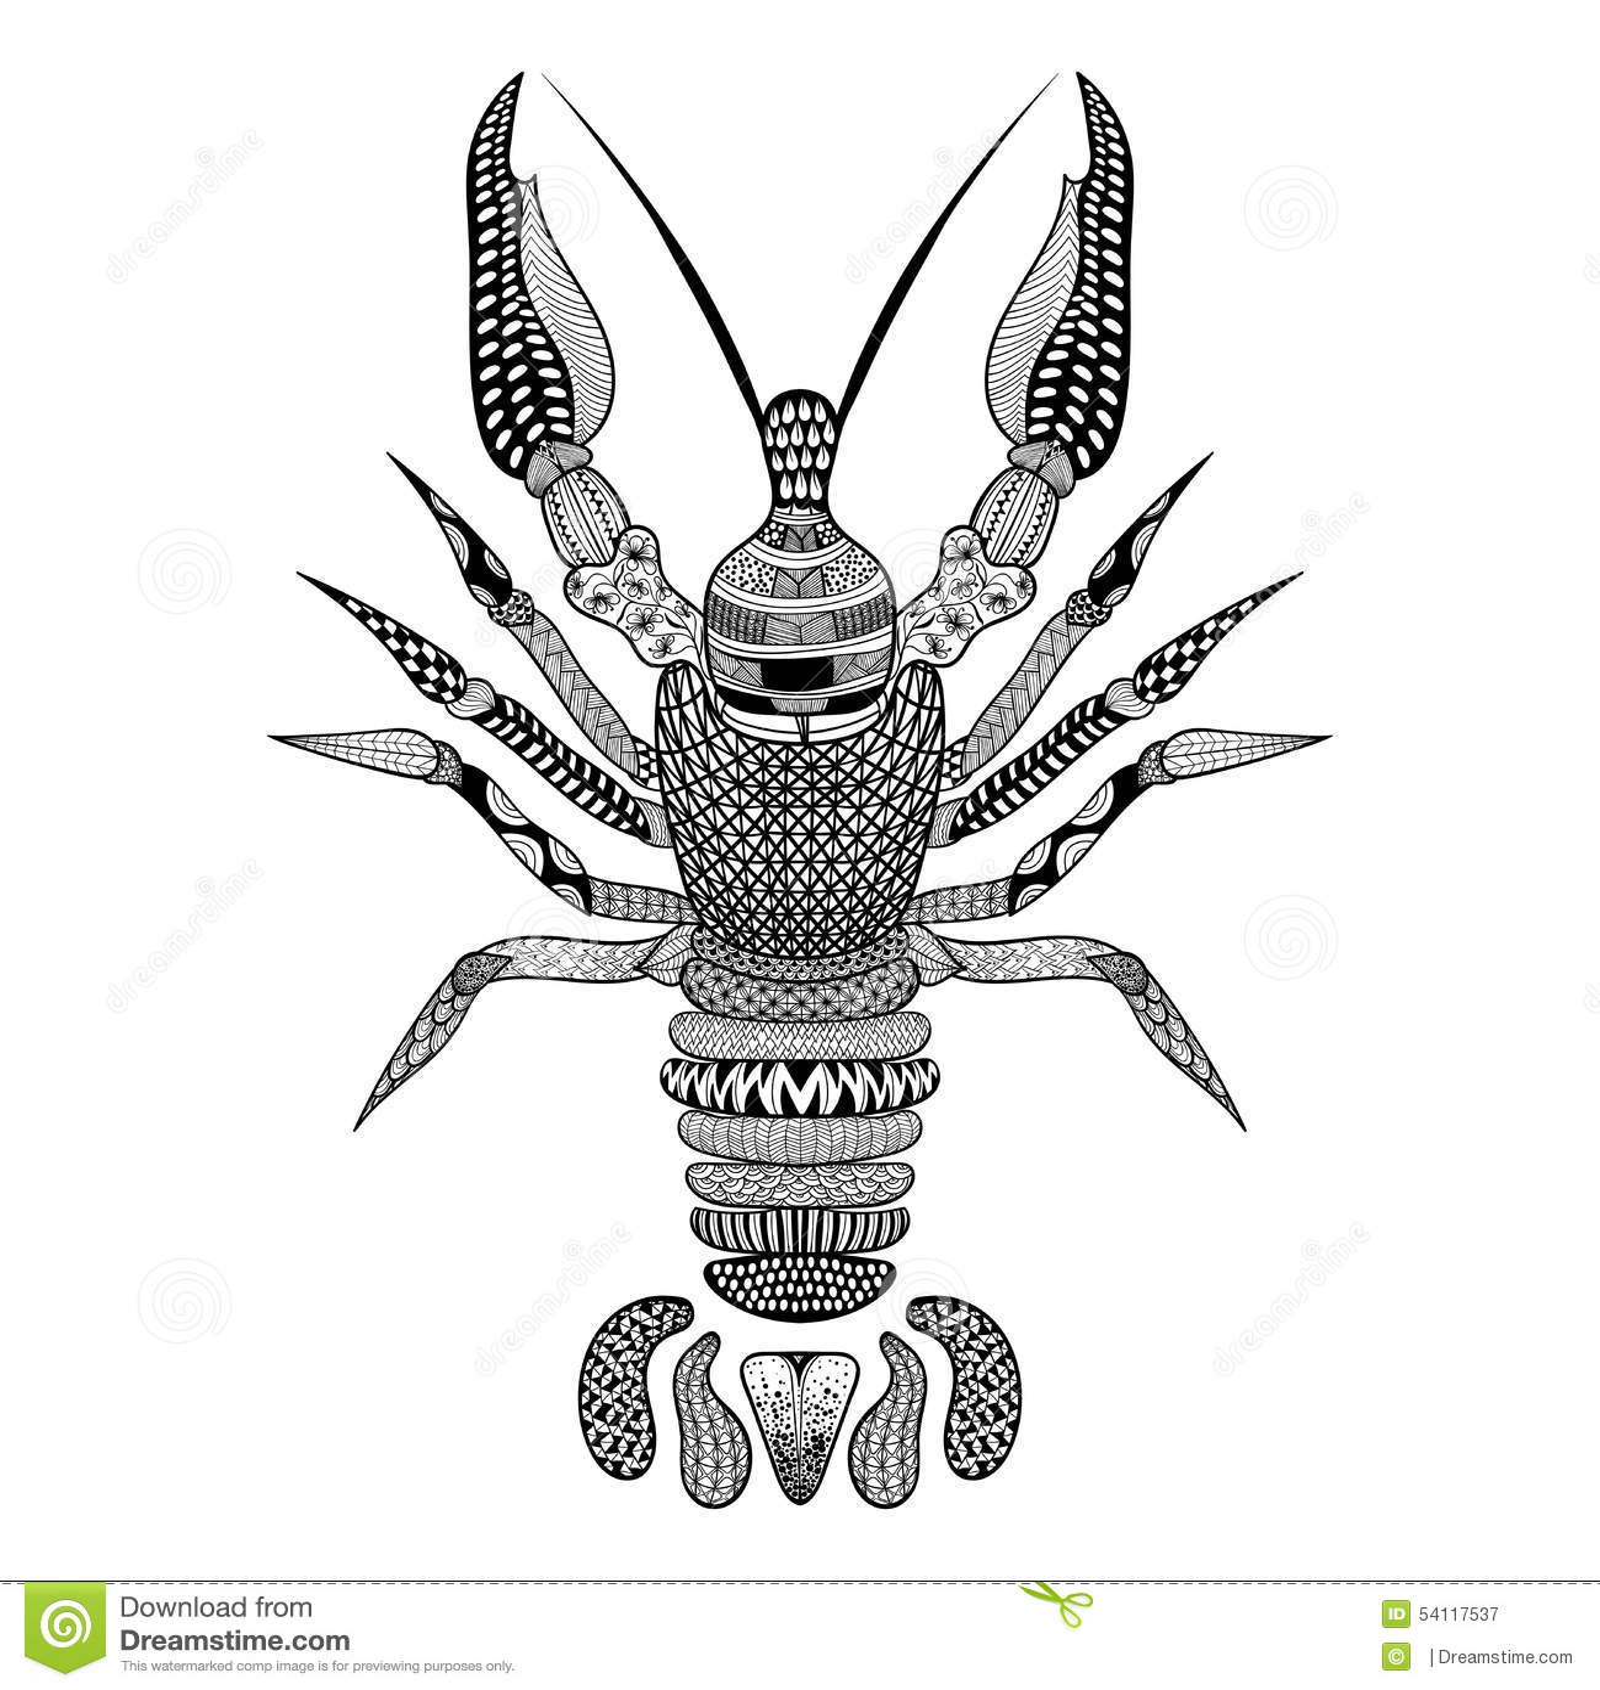 Zentangle Stylized Black Crawfish Hand Drawn Crayfish